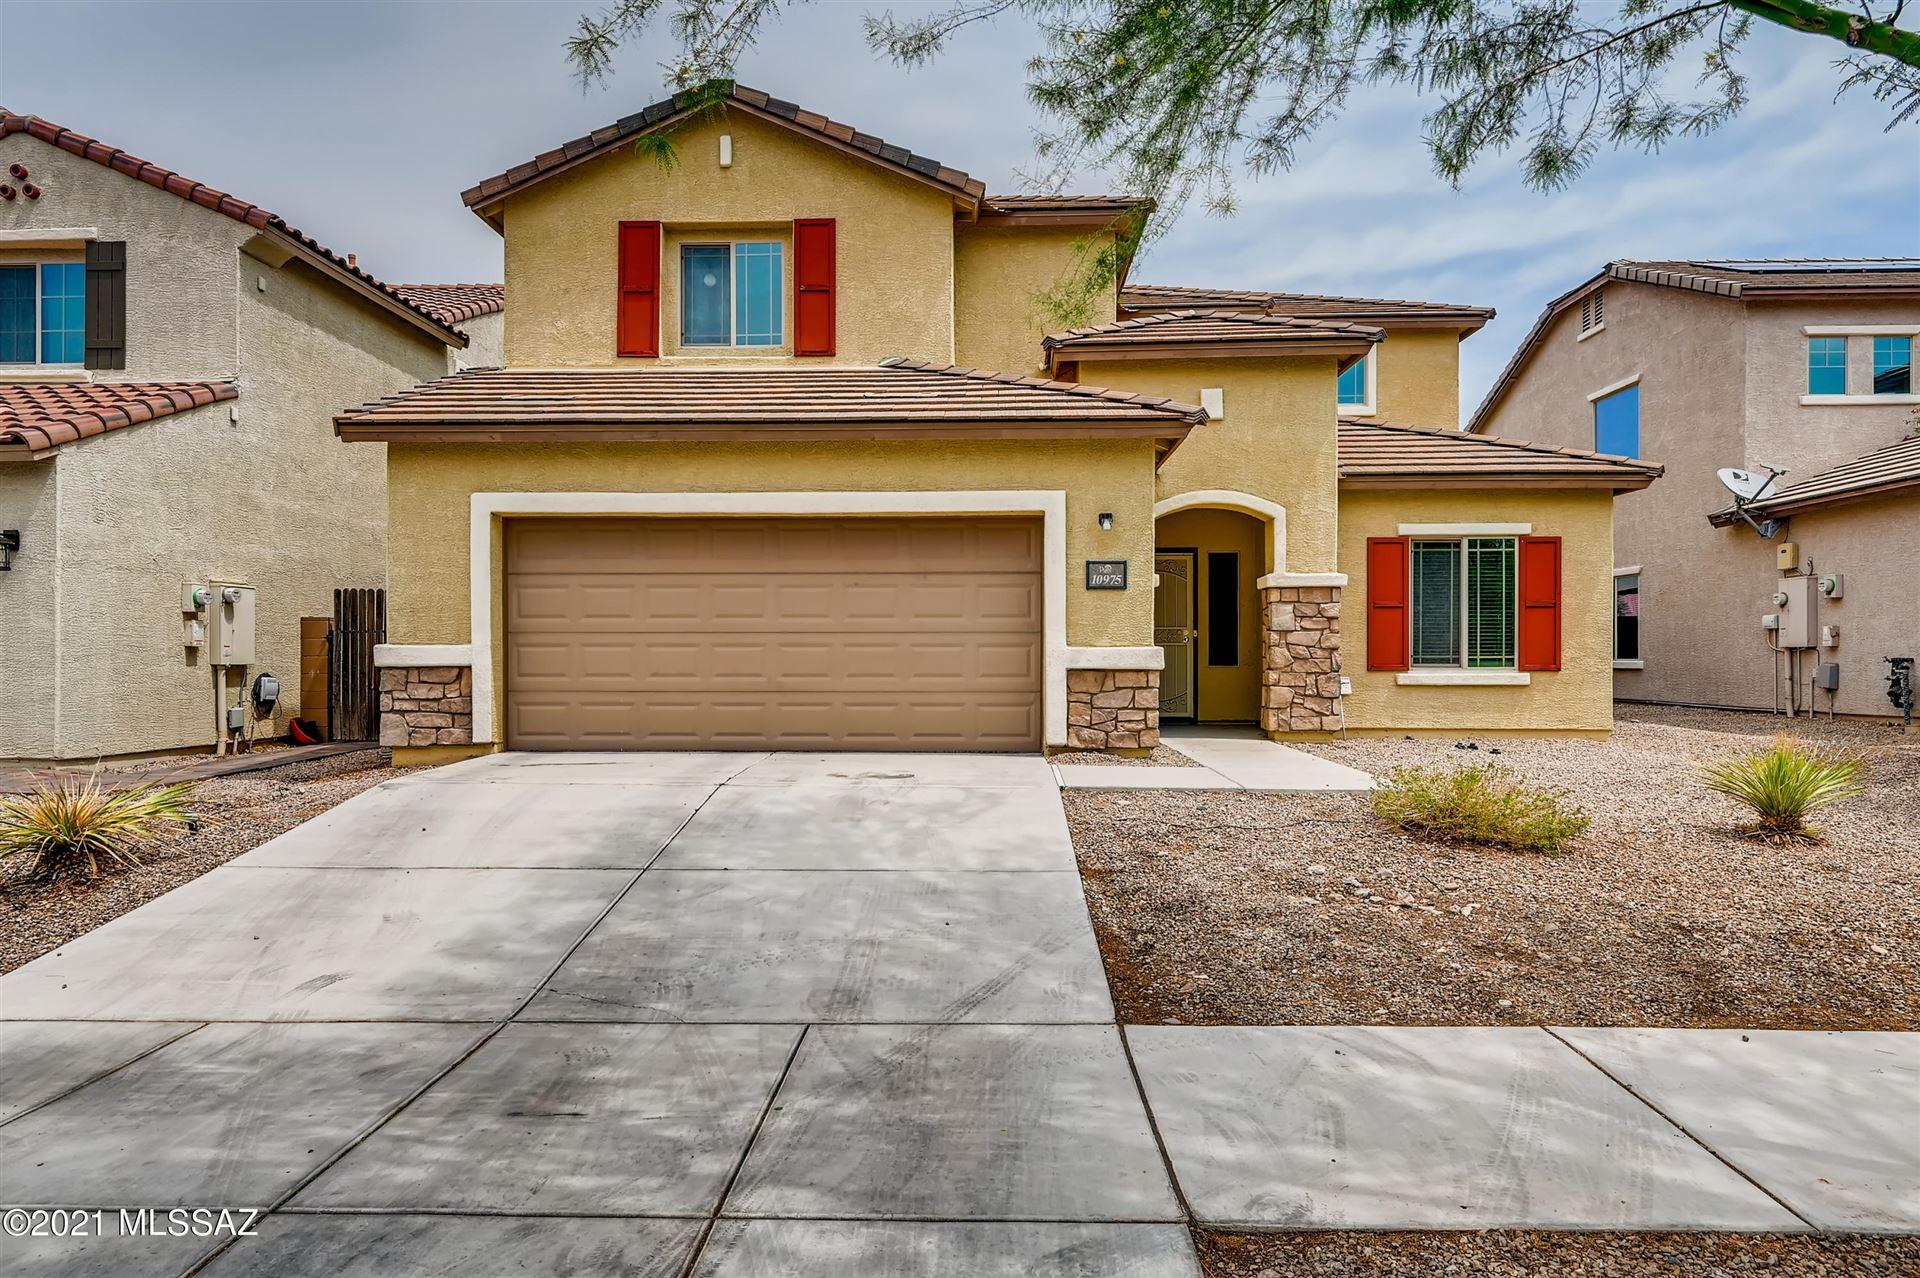 10975 E White Sage Drive, Tucson, AZ 85747 - MLS#: 22118581